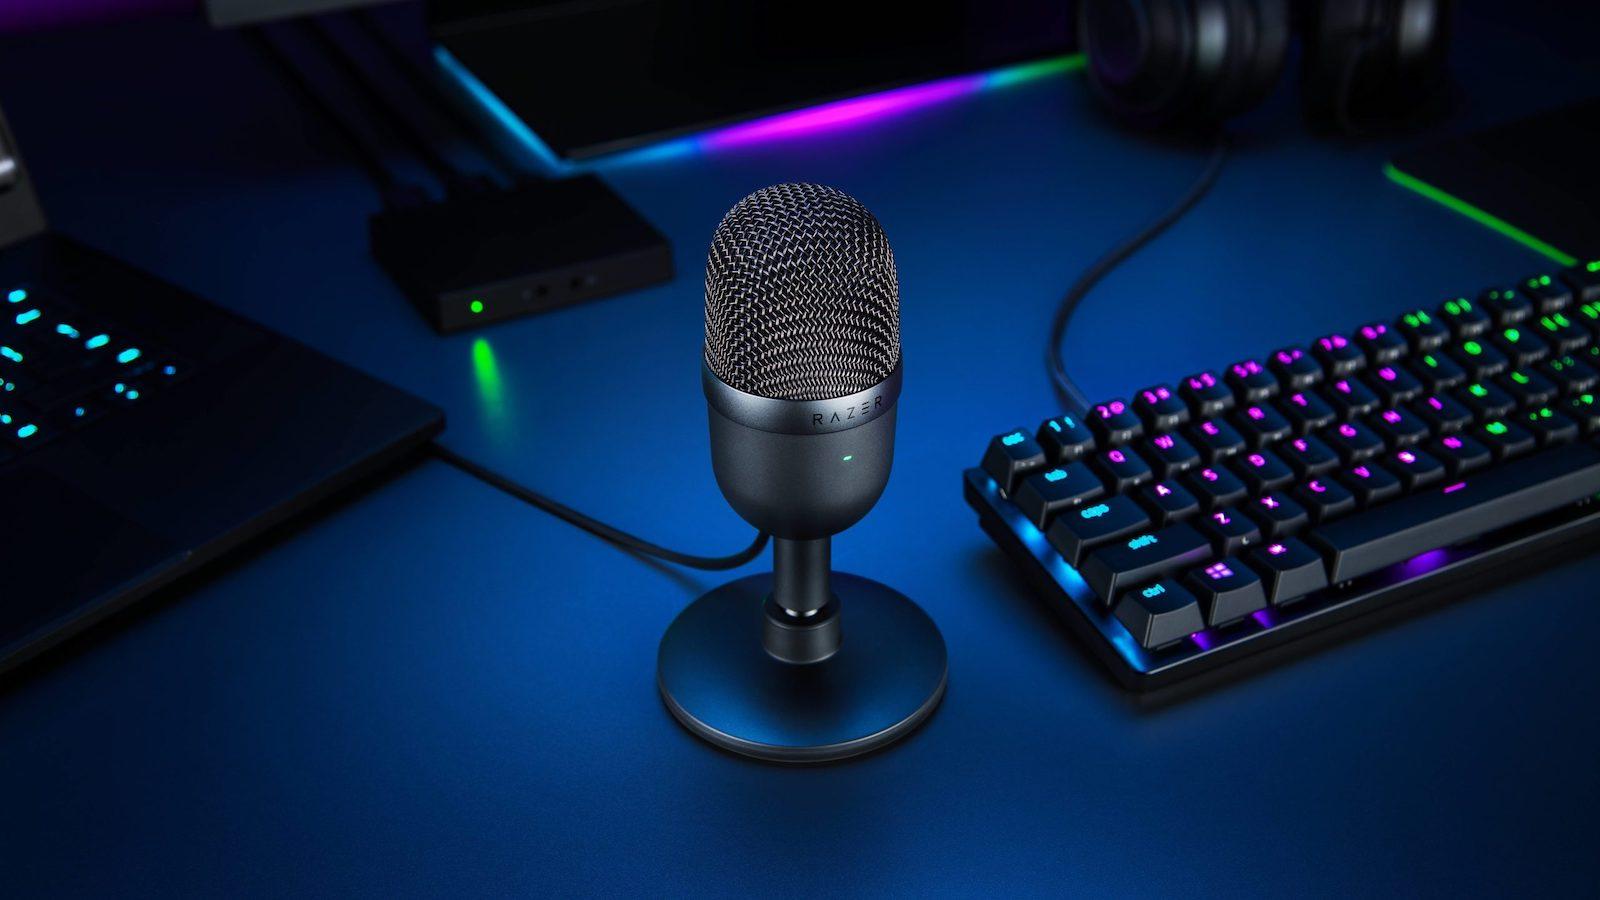 Razer Seiren Mini portable microphone uses a precise supercardioid pickup pattern